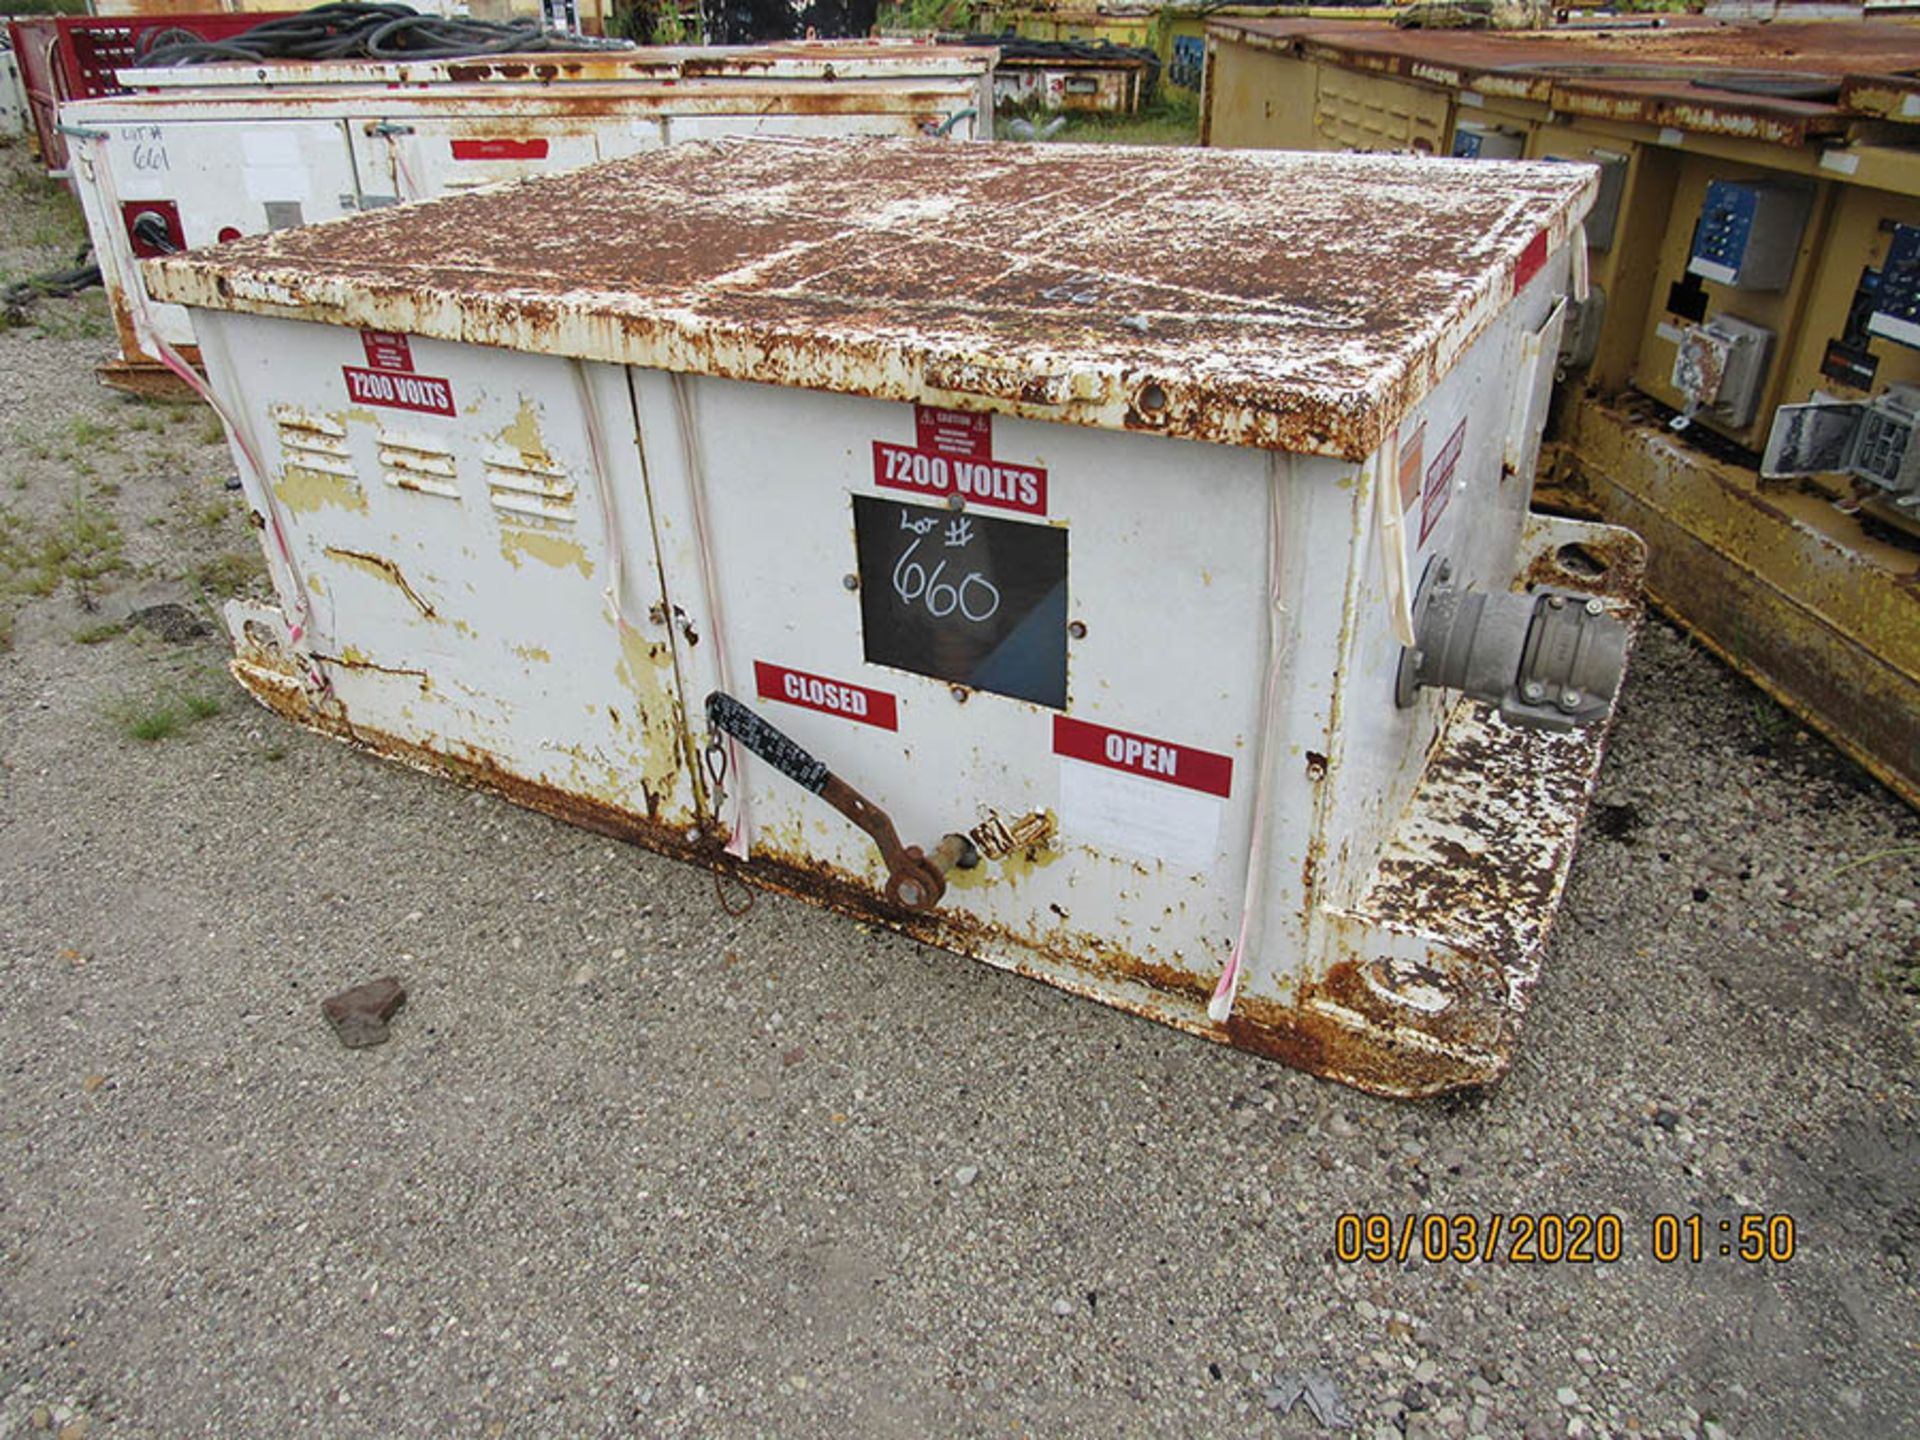 Lot 660 - AMERICAN ELECTRIC EQUIPMENT POWER CENTER, 7,200 V., S/N 9855-397